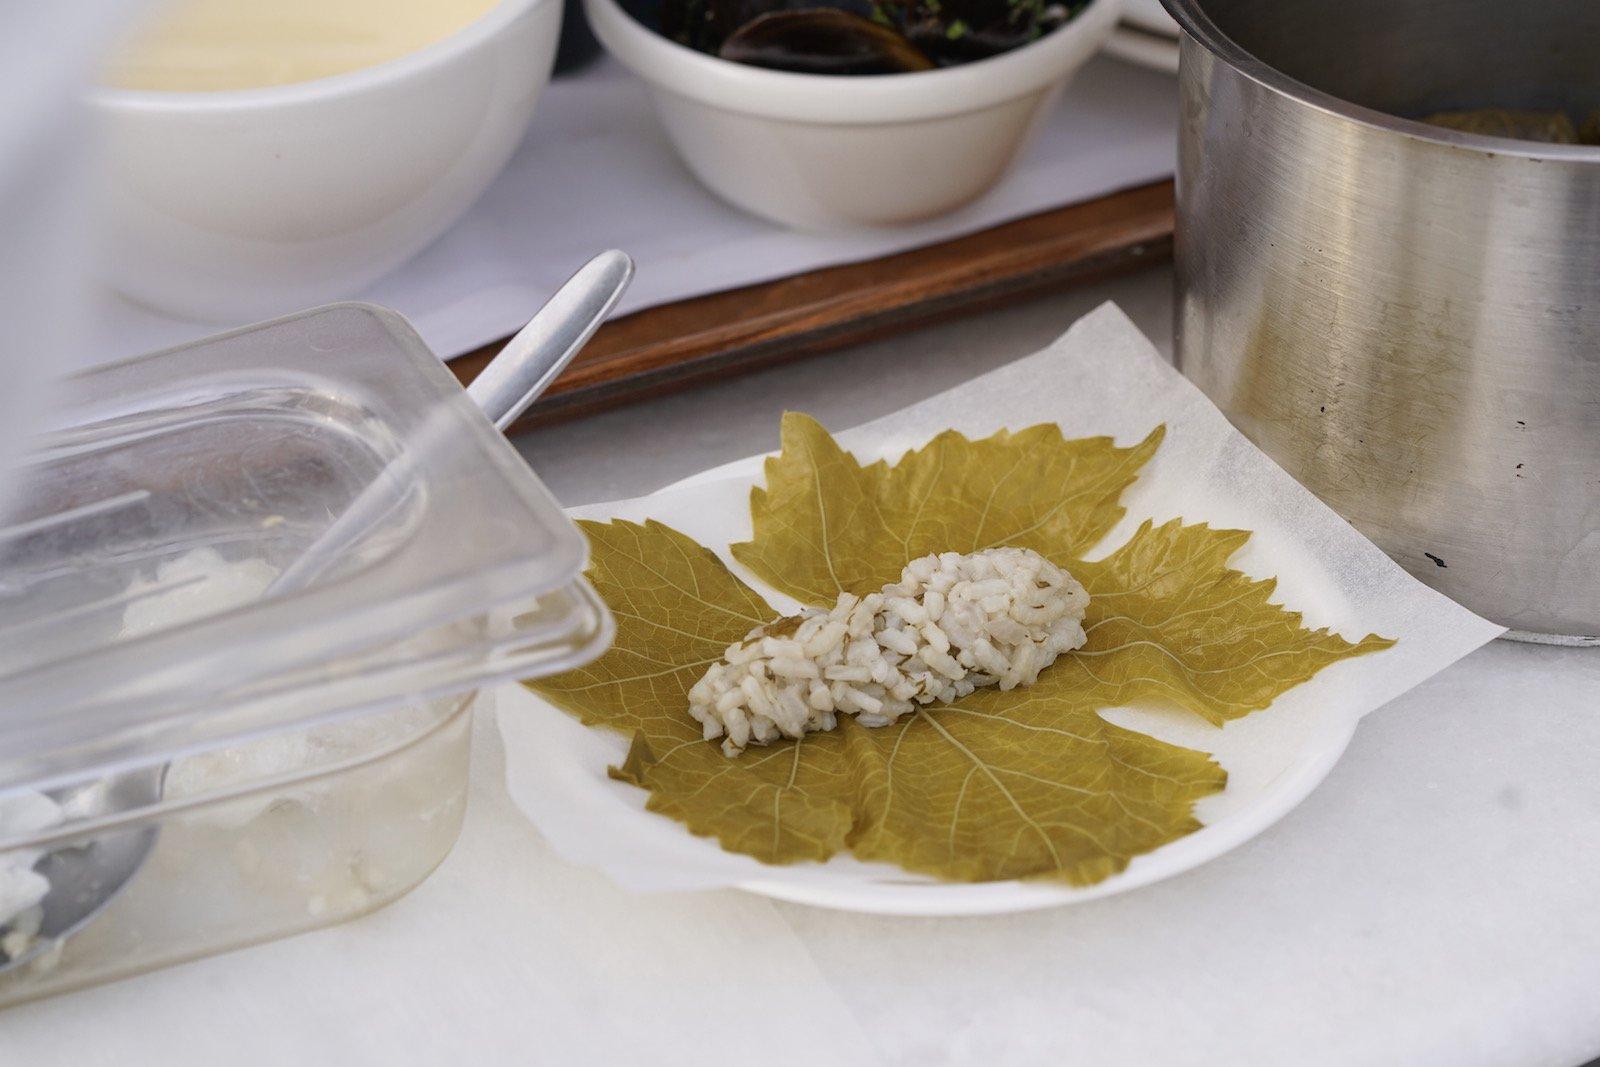 Stuffed Grape Leaves (Dolmades) from the Chef at Perivolas, Santorini Dairy & Gluten Free